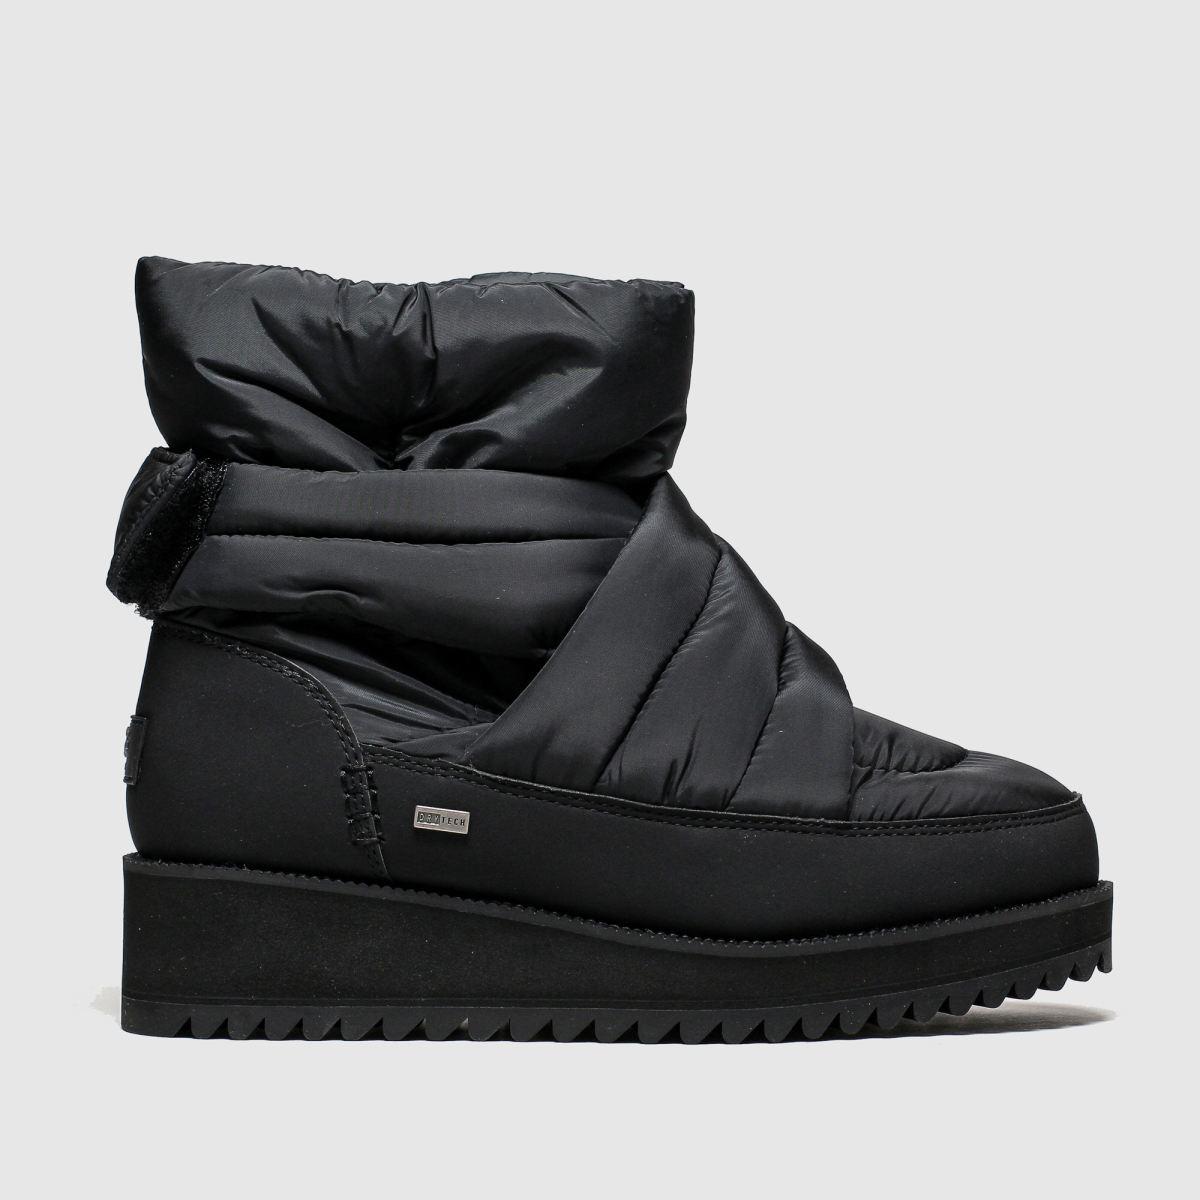 Ugg Black Montara Boots